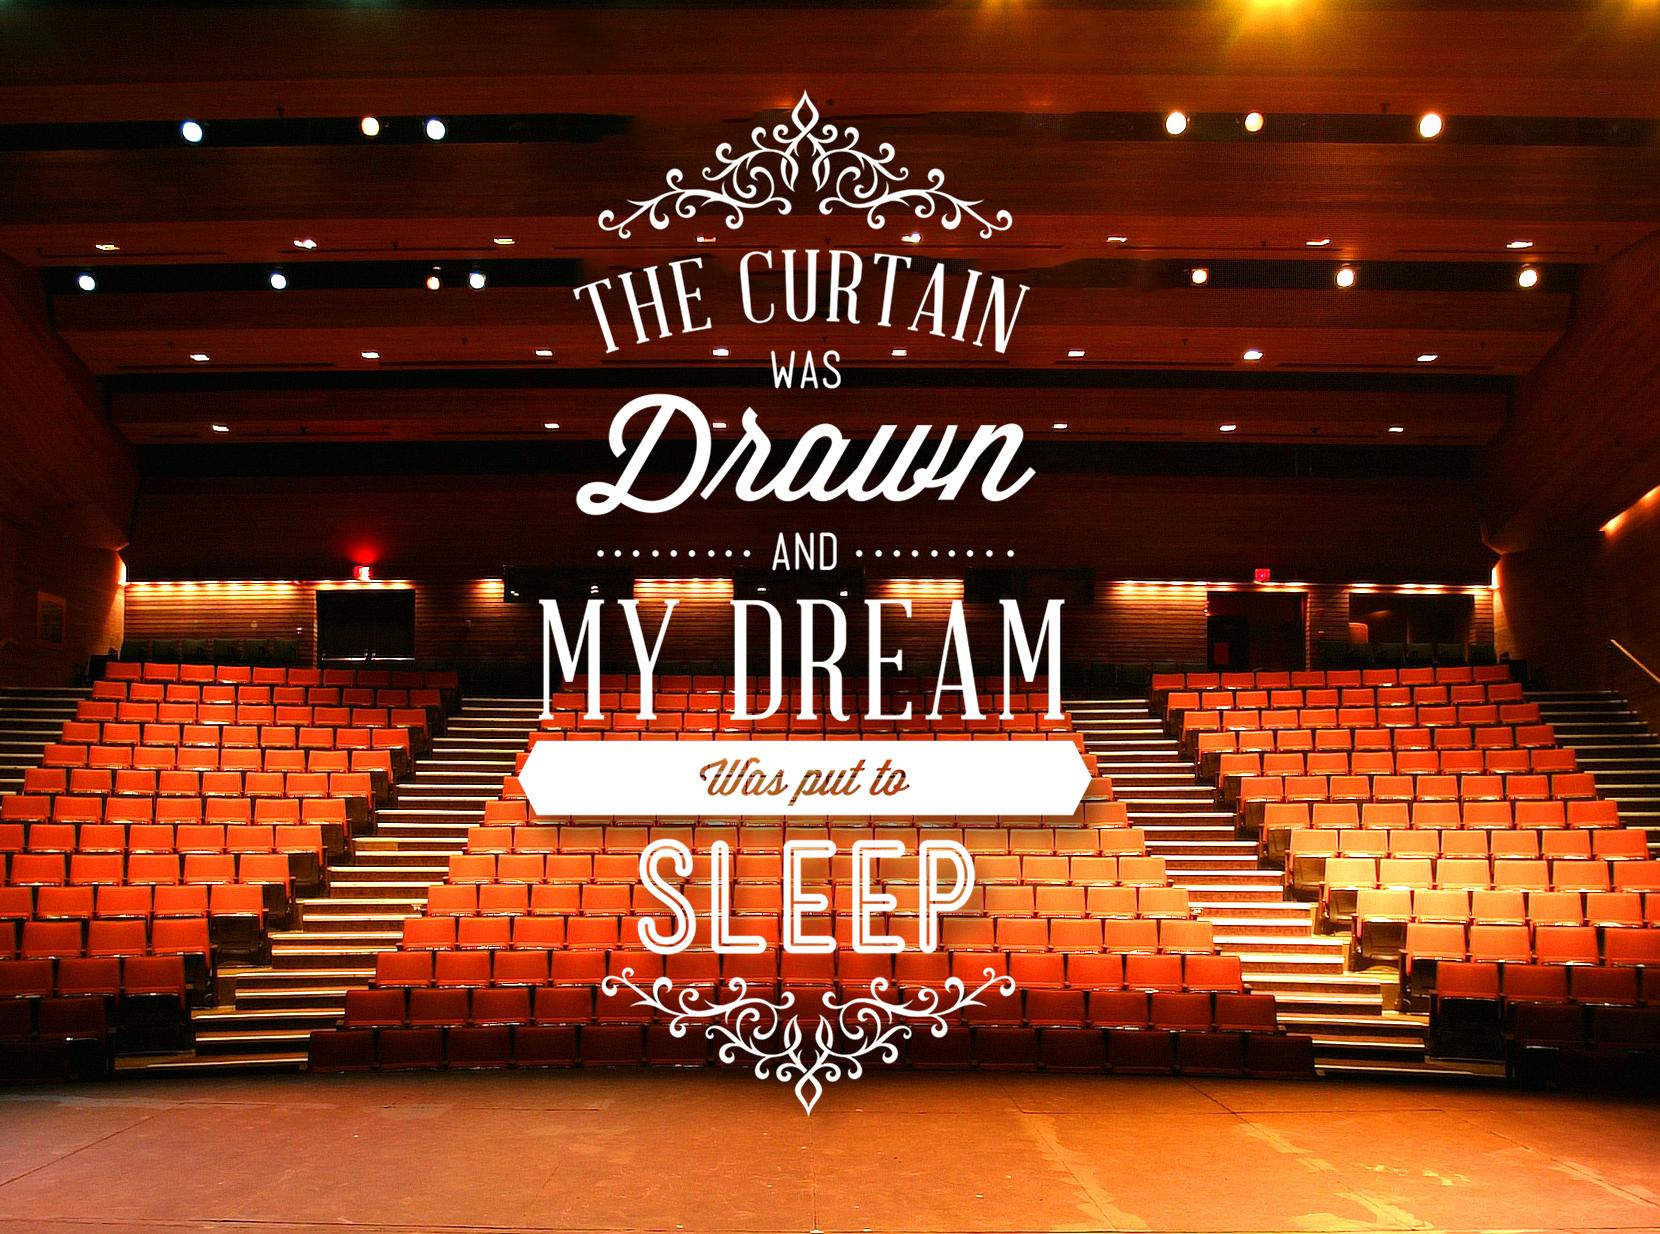 Dream_Stage.jpg